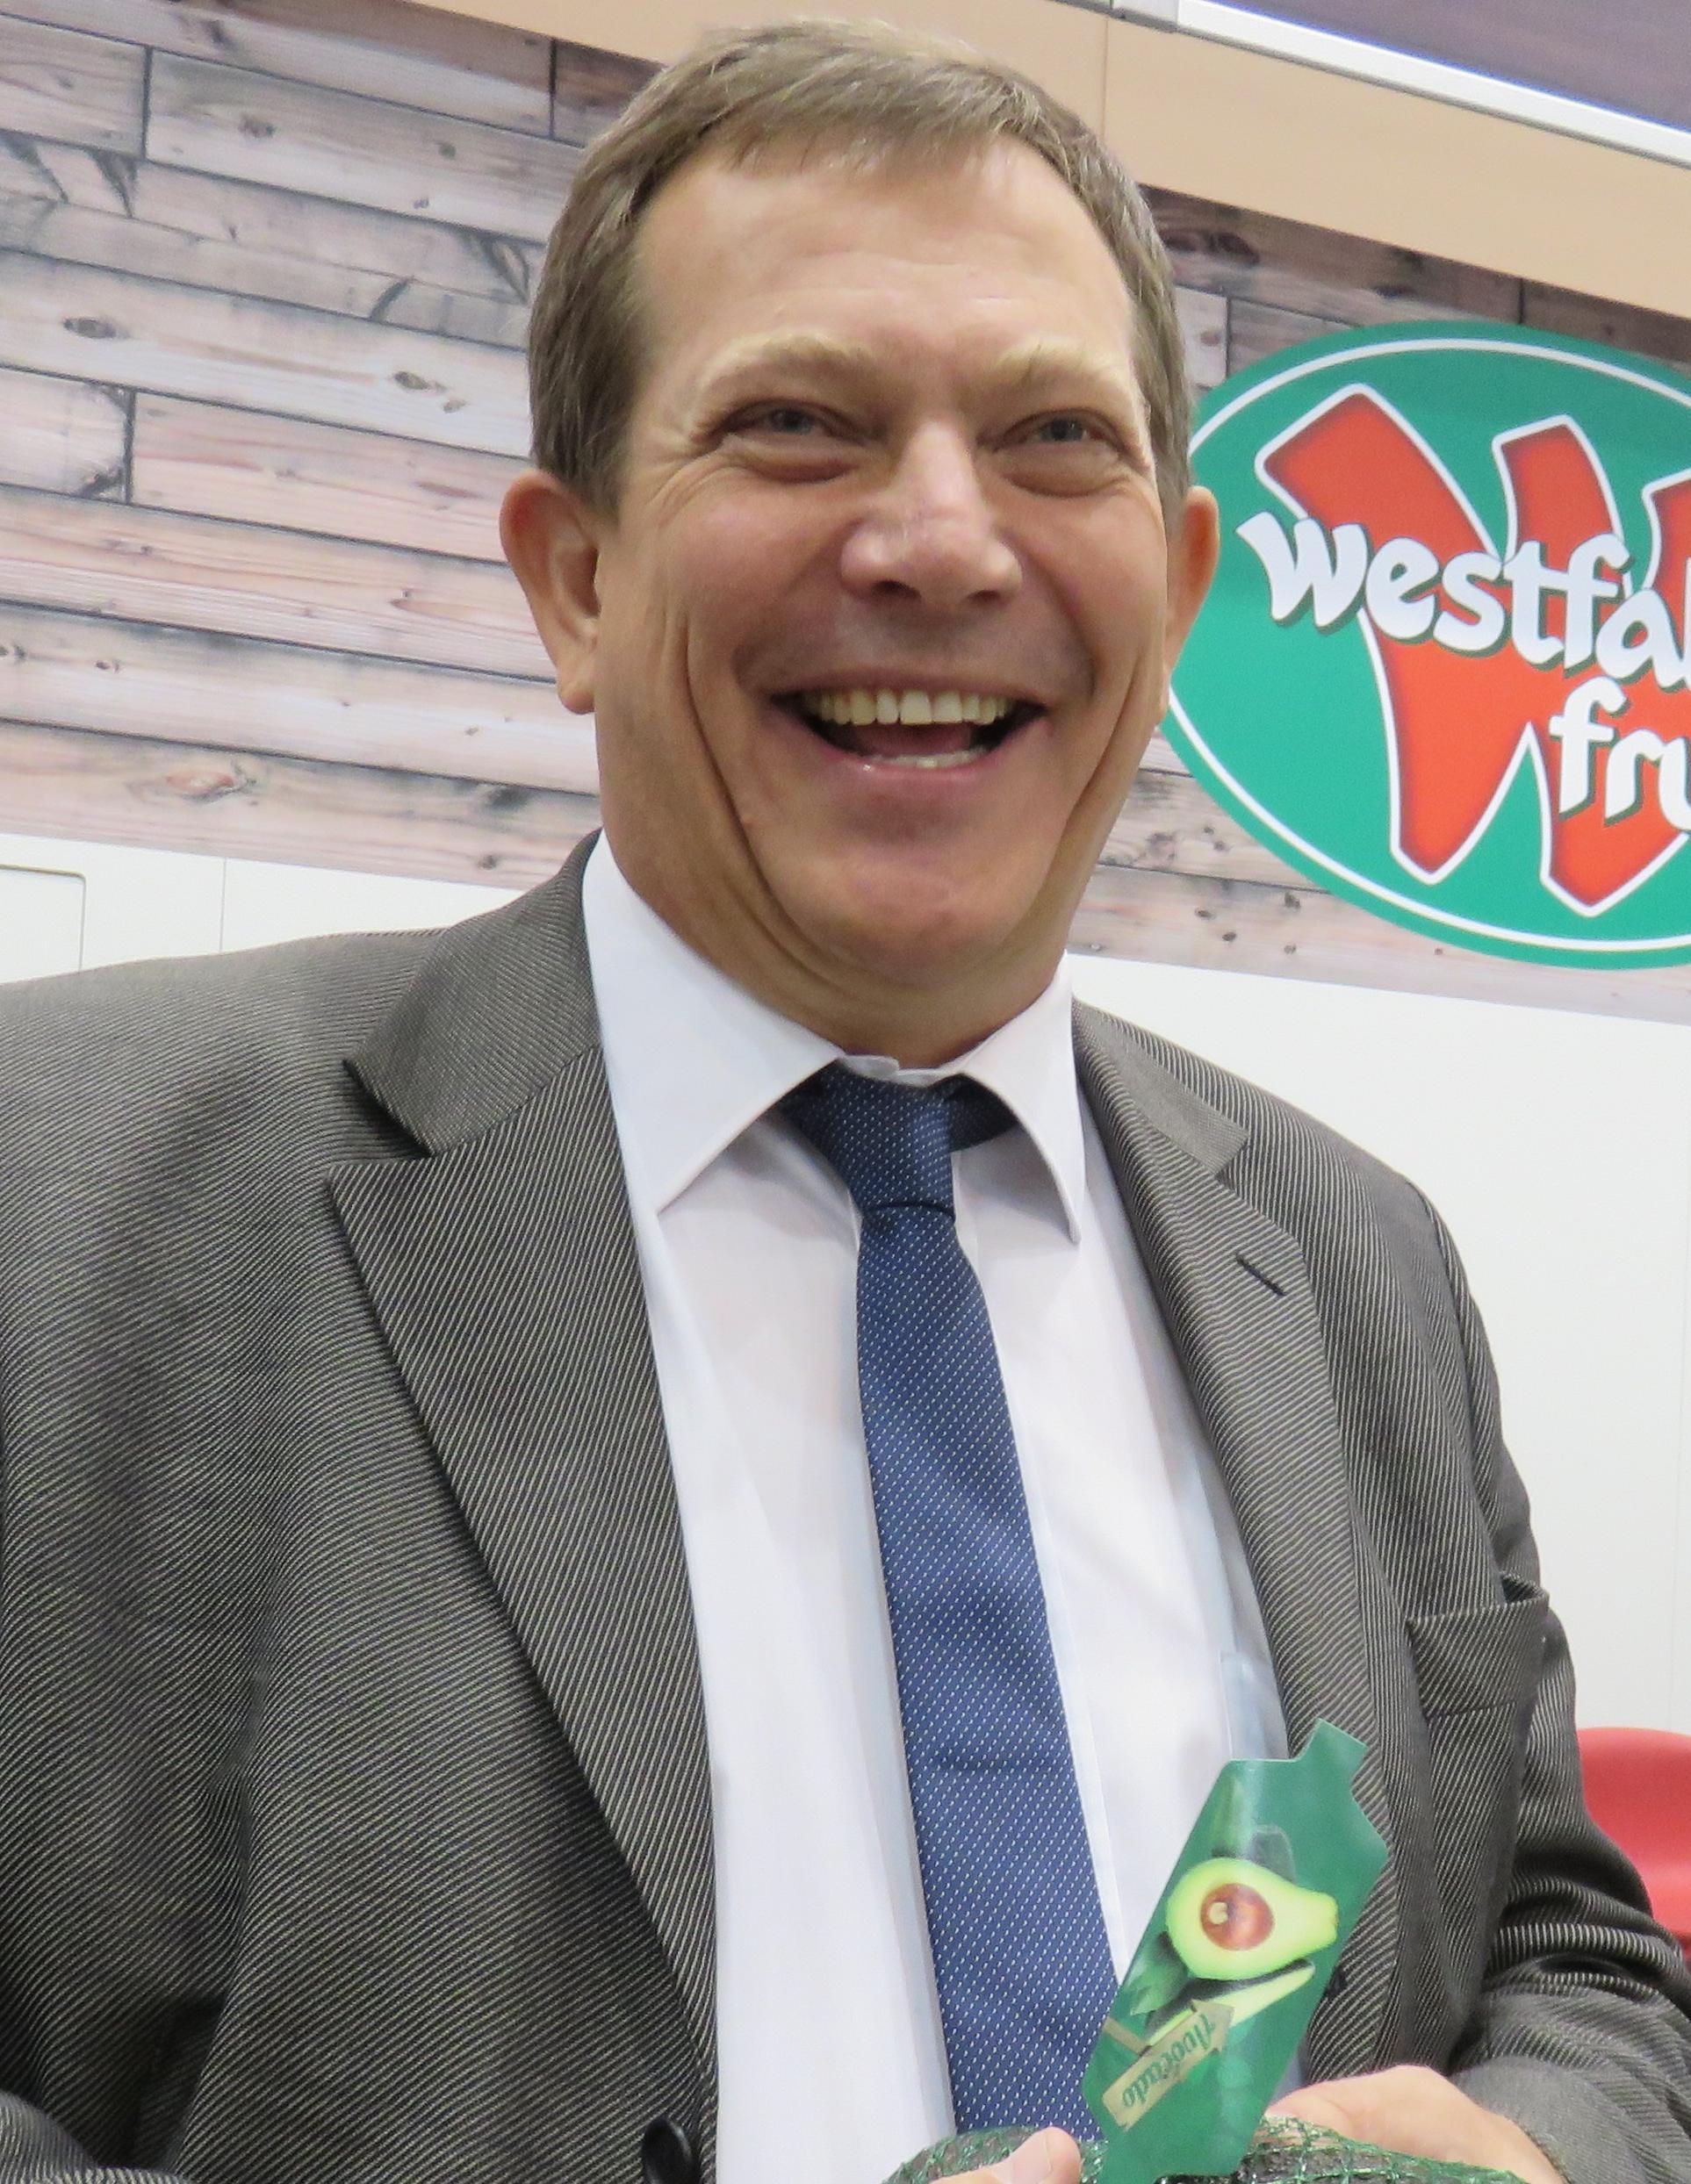 Westfalia Fruit Competitors, Revenue and Employees - Owler